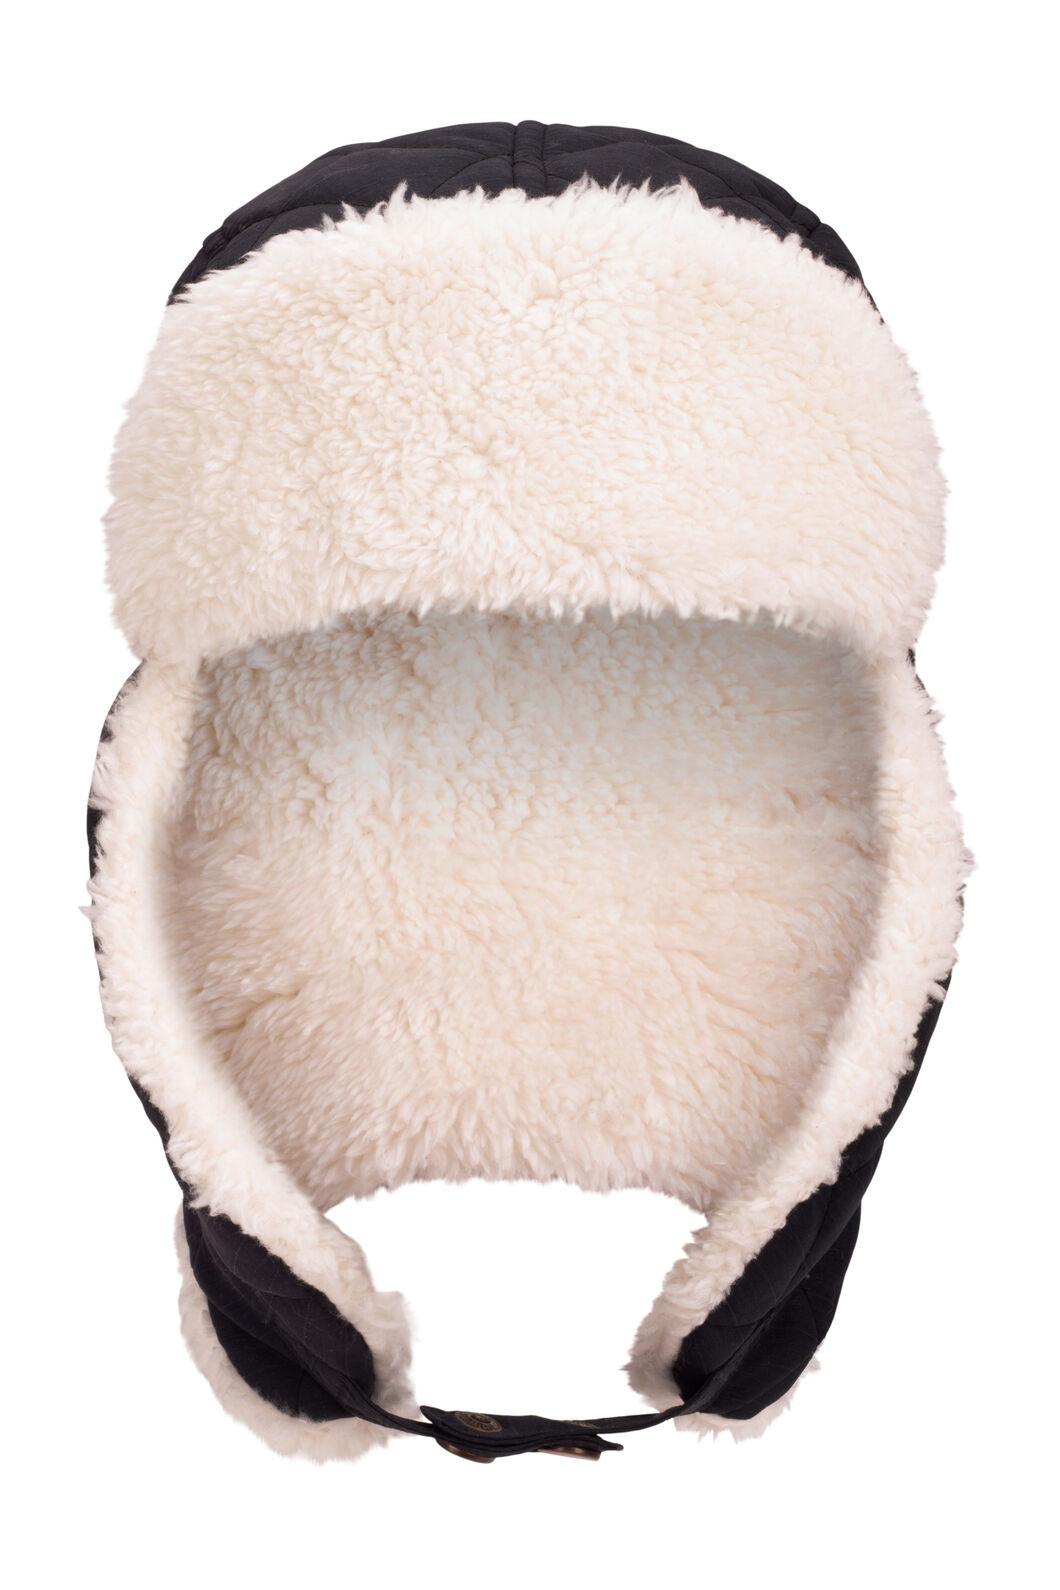 Macpac Winter Quilted Hat, Black, hi-res